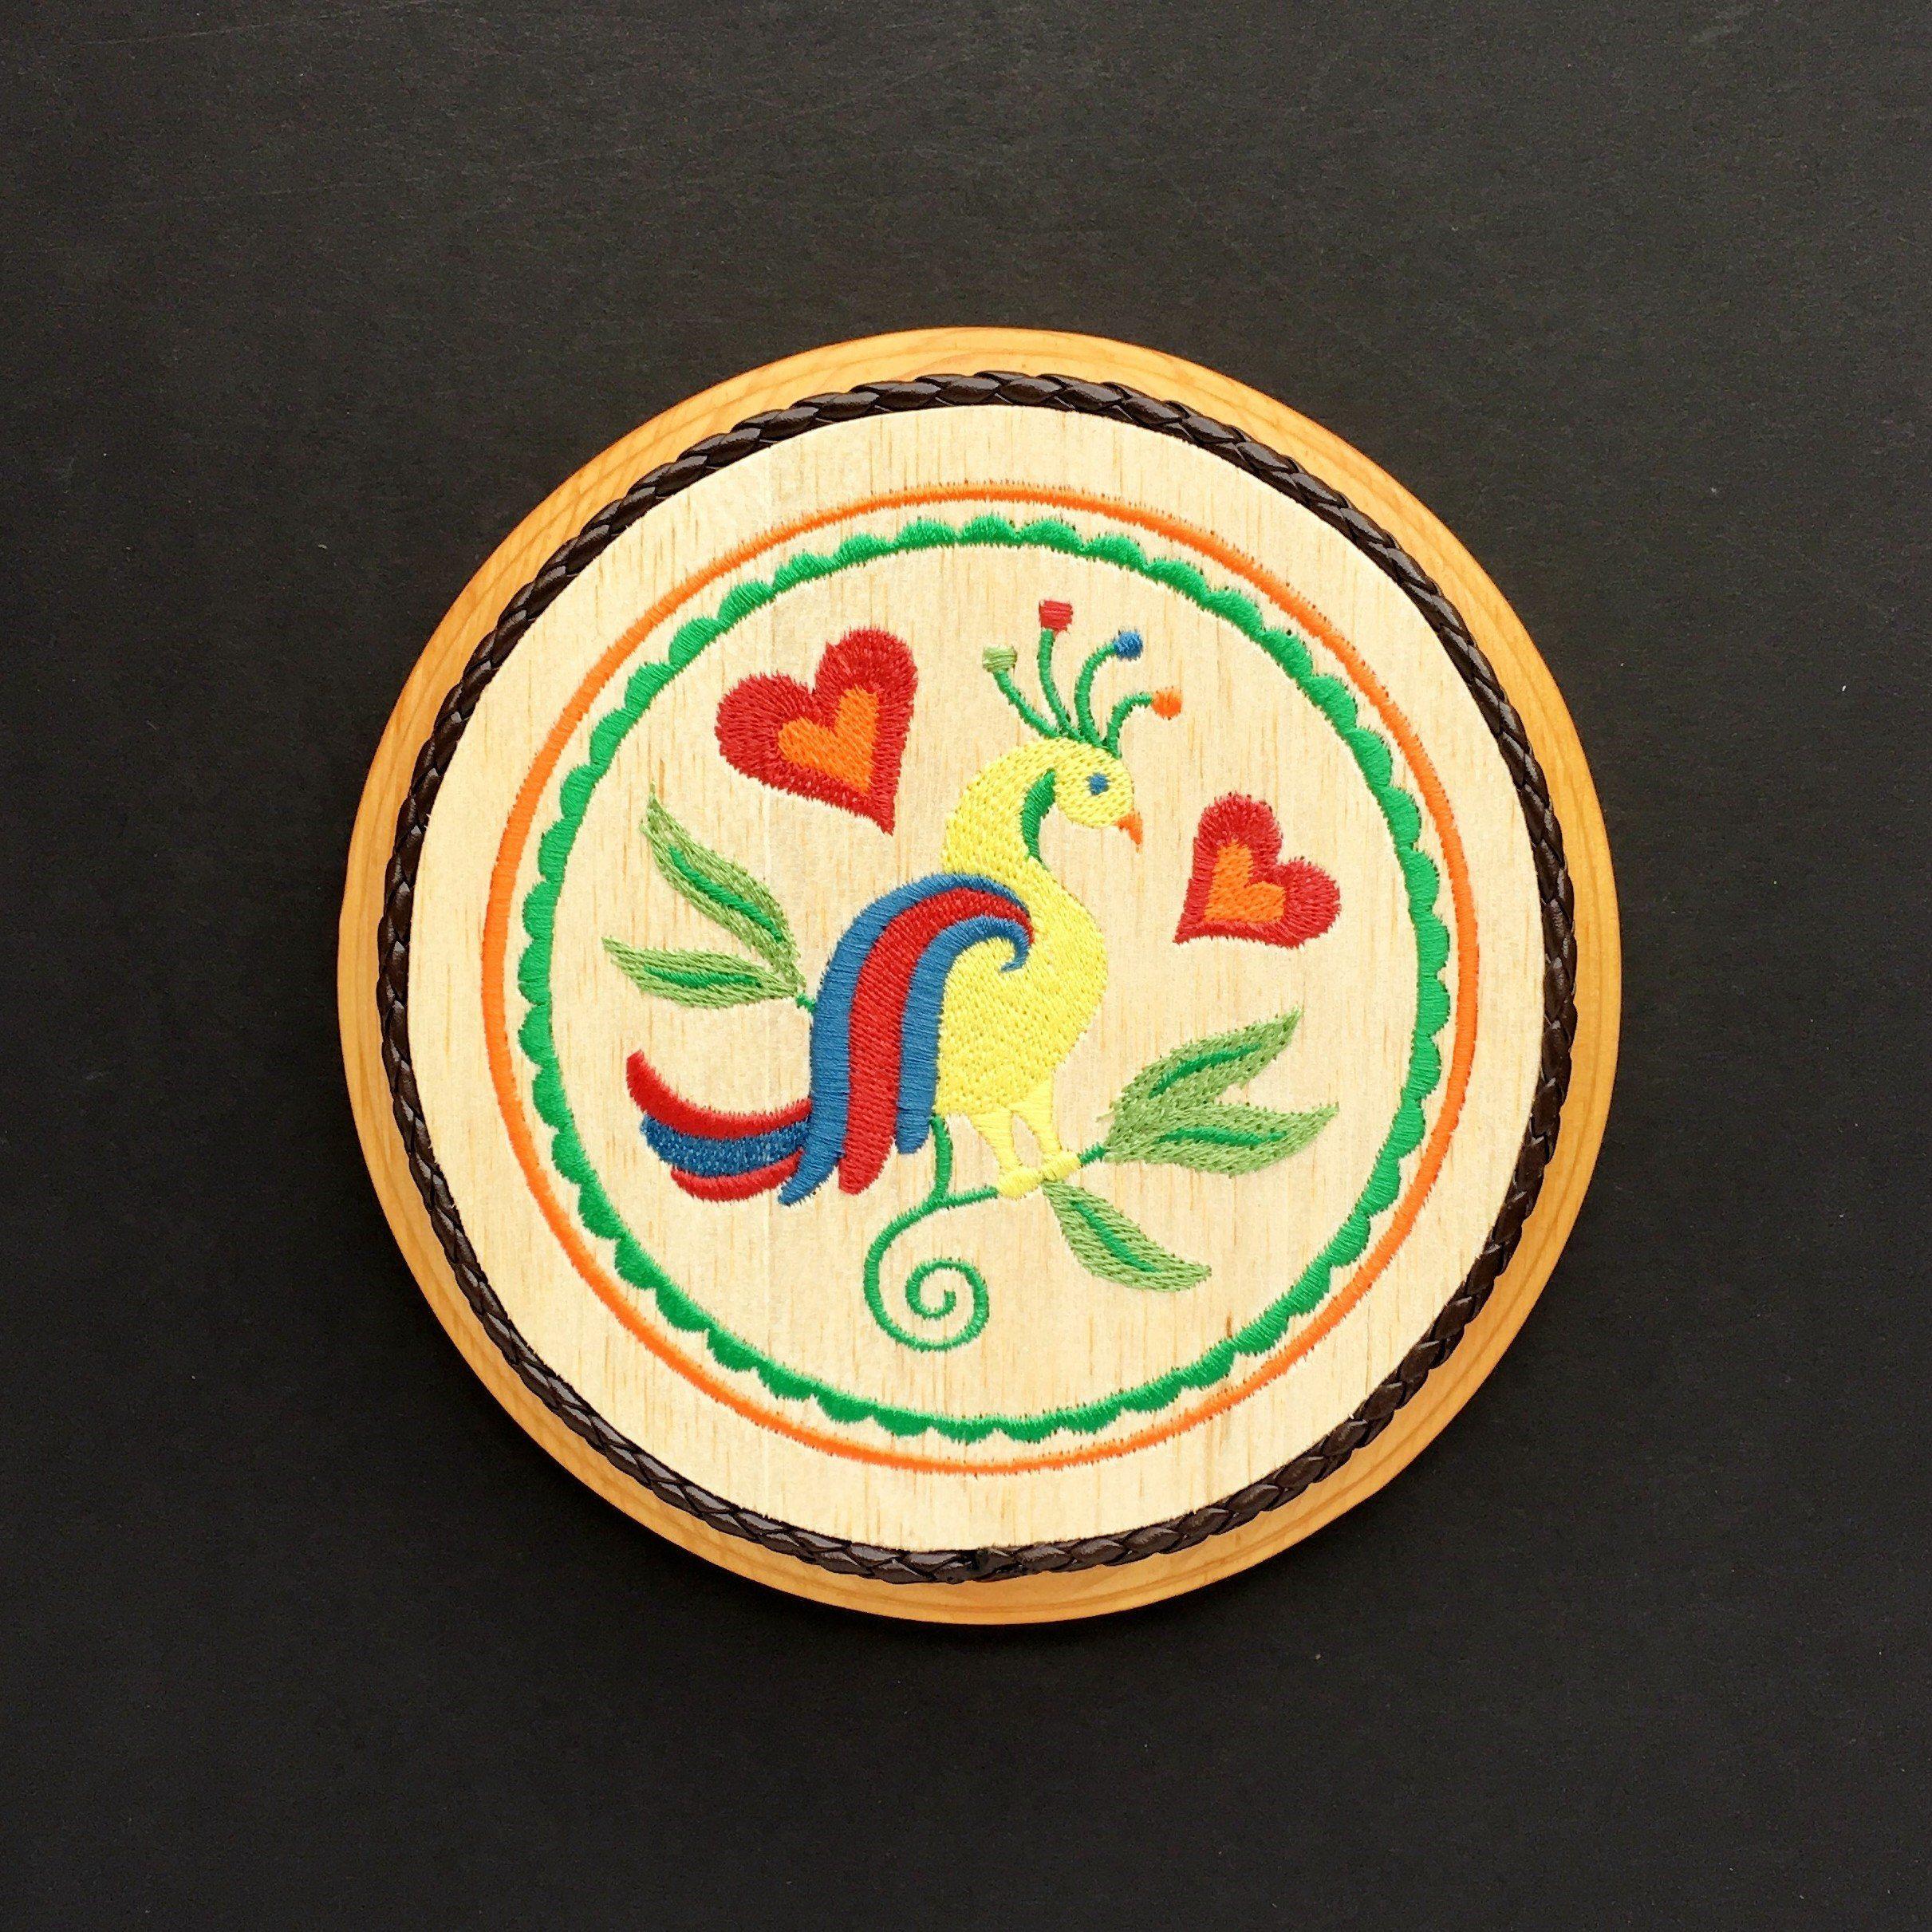 Distelfink pennsylvania dutch indoor hex sign embroidery art on